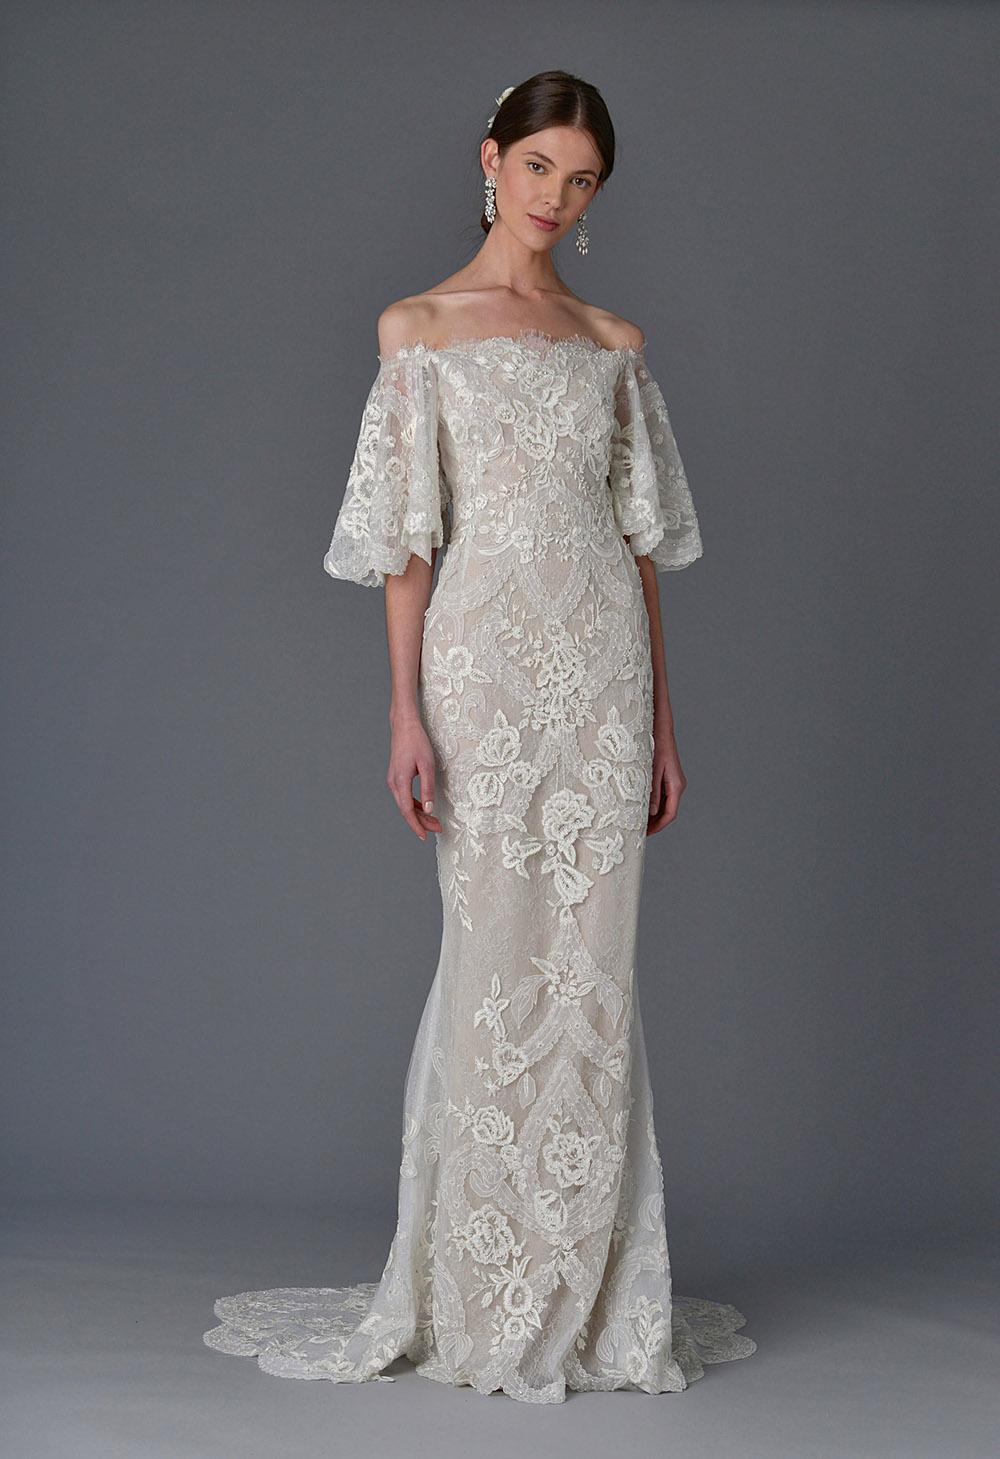 Marchesa Spring and Summer 2017 Bridal Collection 02 - Spring/Summer Wedding Dress Inspiration